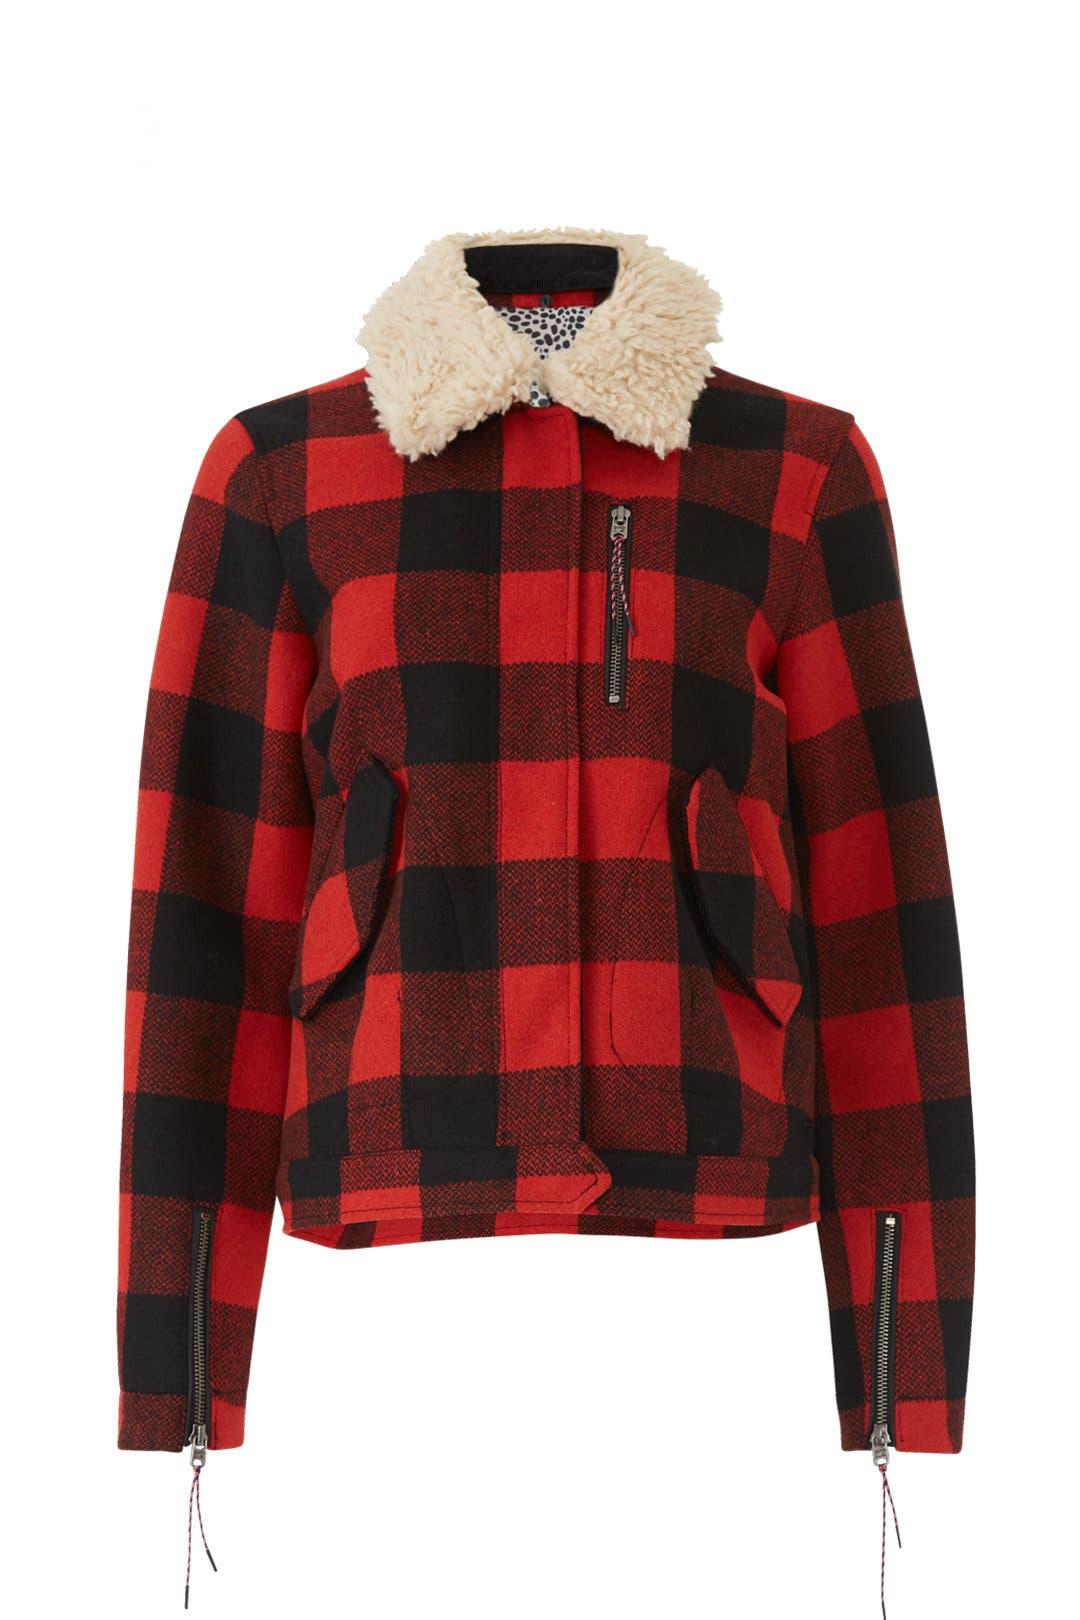 35b261a573e Lumberjack Check Trucker Jacket by Scotch   Soda for  45